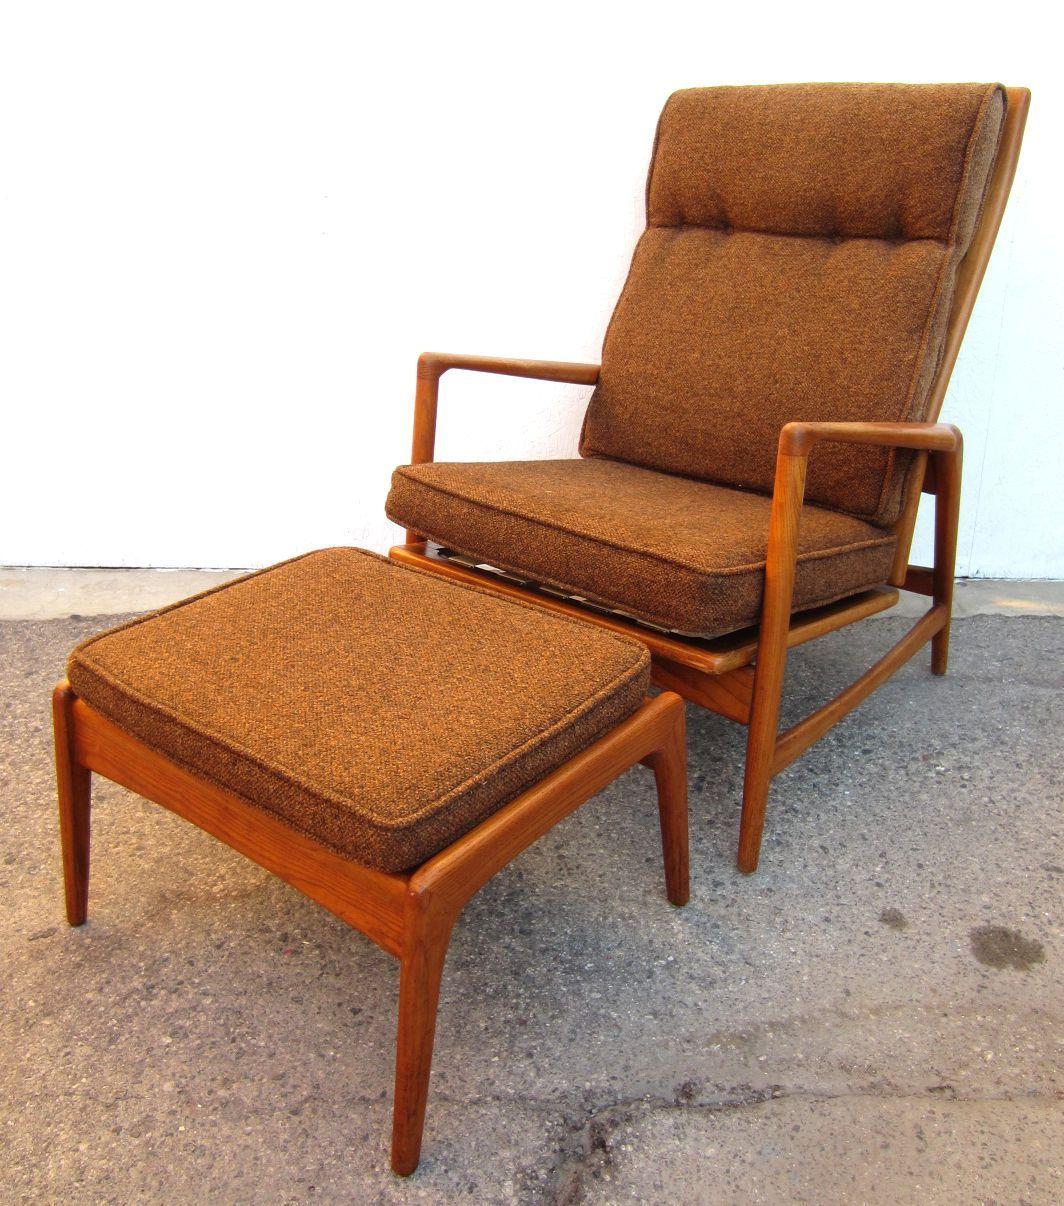 1950 Danish Mid Century Modern Lounge Chair And Ottoman, Ib Kofod Larsen  Image 4